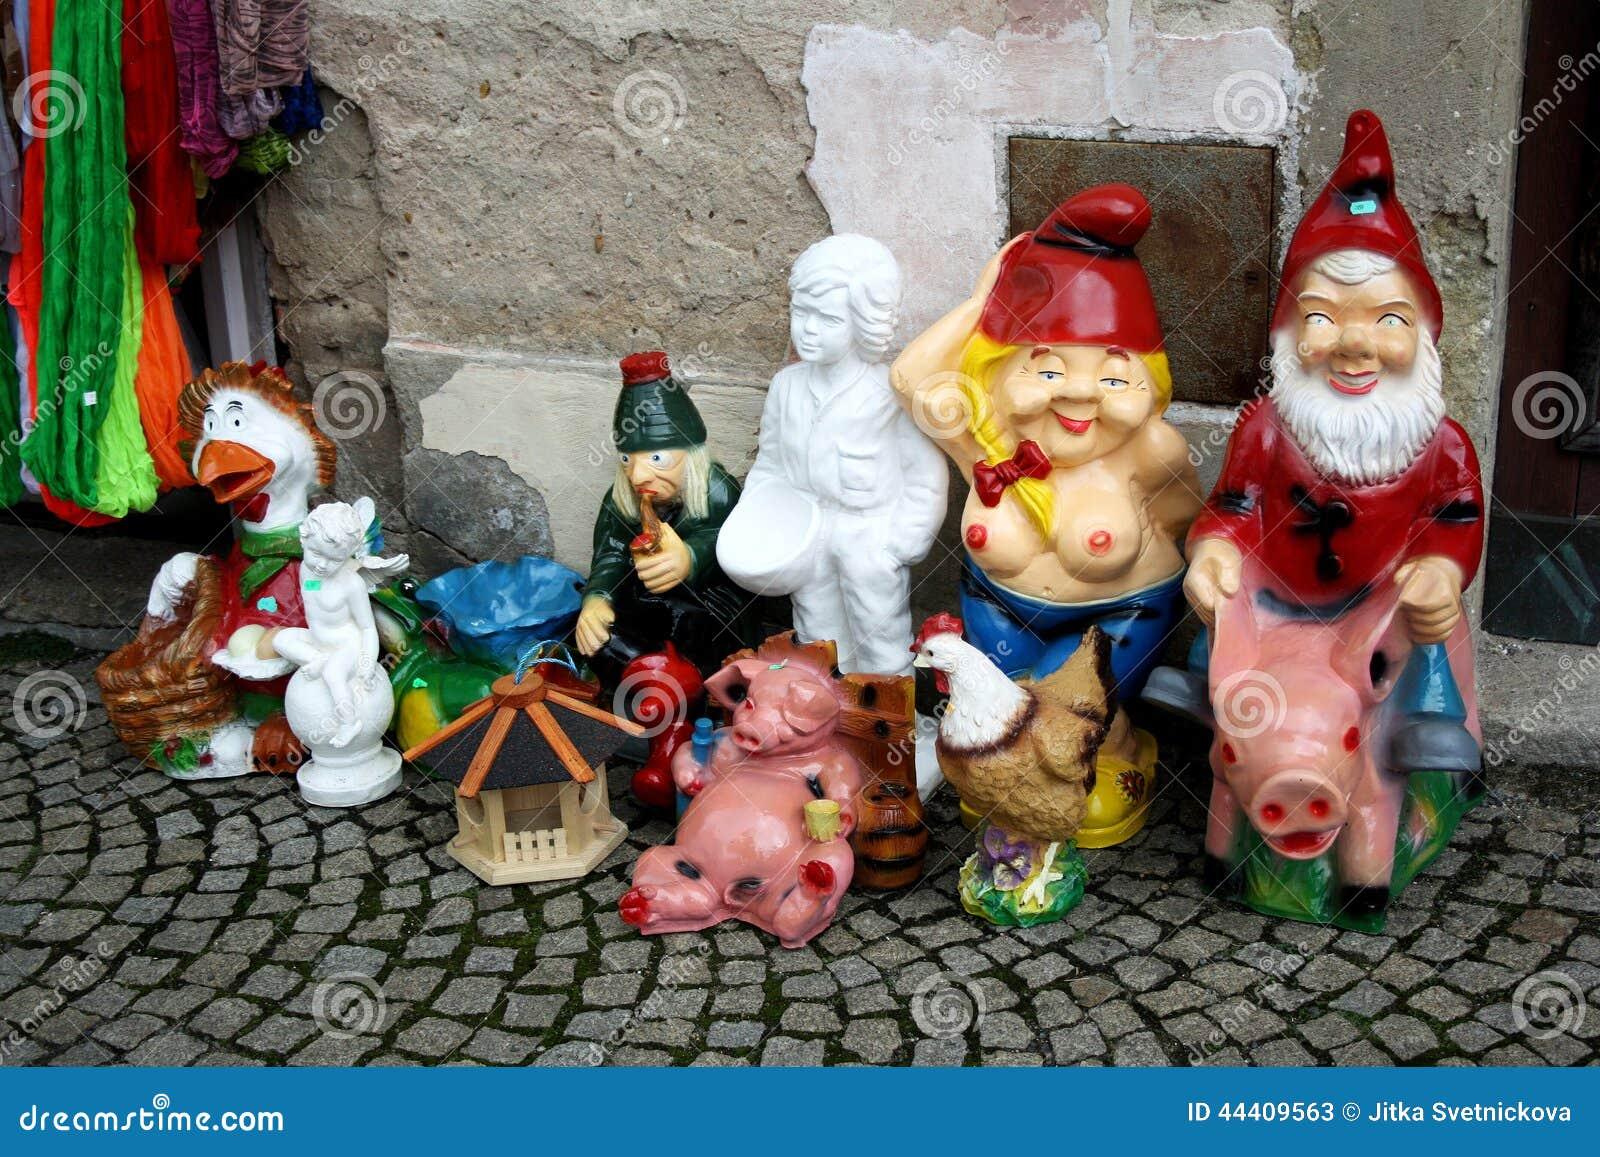 Bon Download Several Decorative Garden Statues Stock Image   Image Of  Figurines, Sale: 44409563